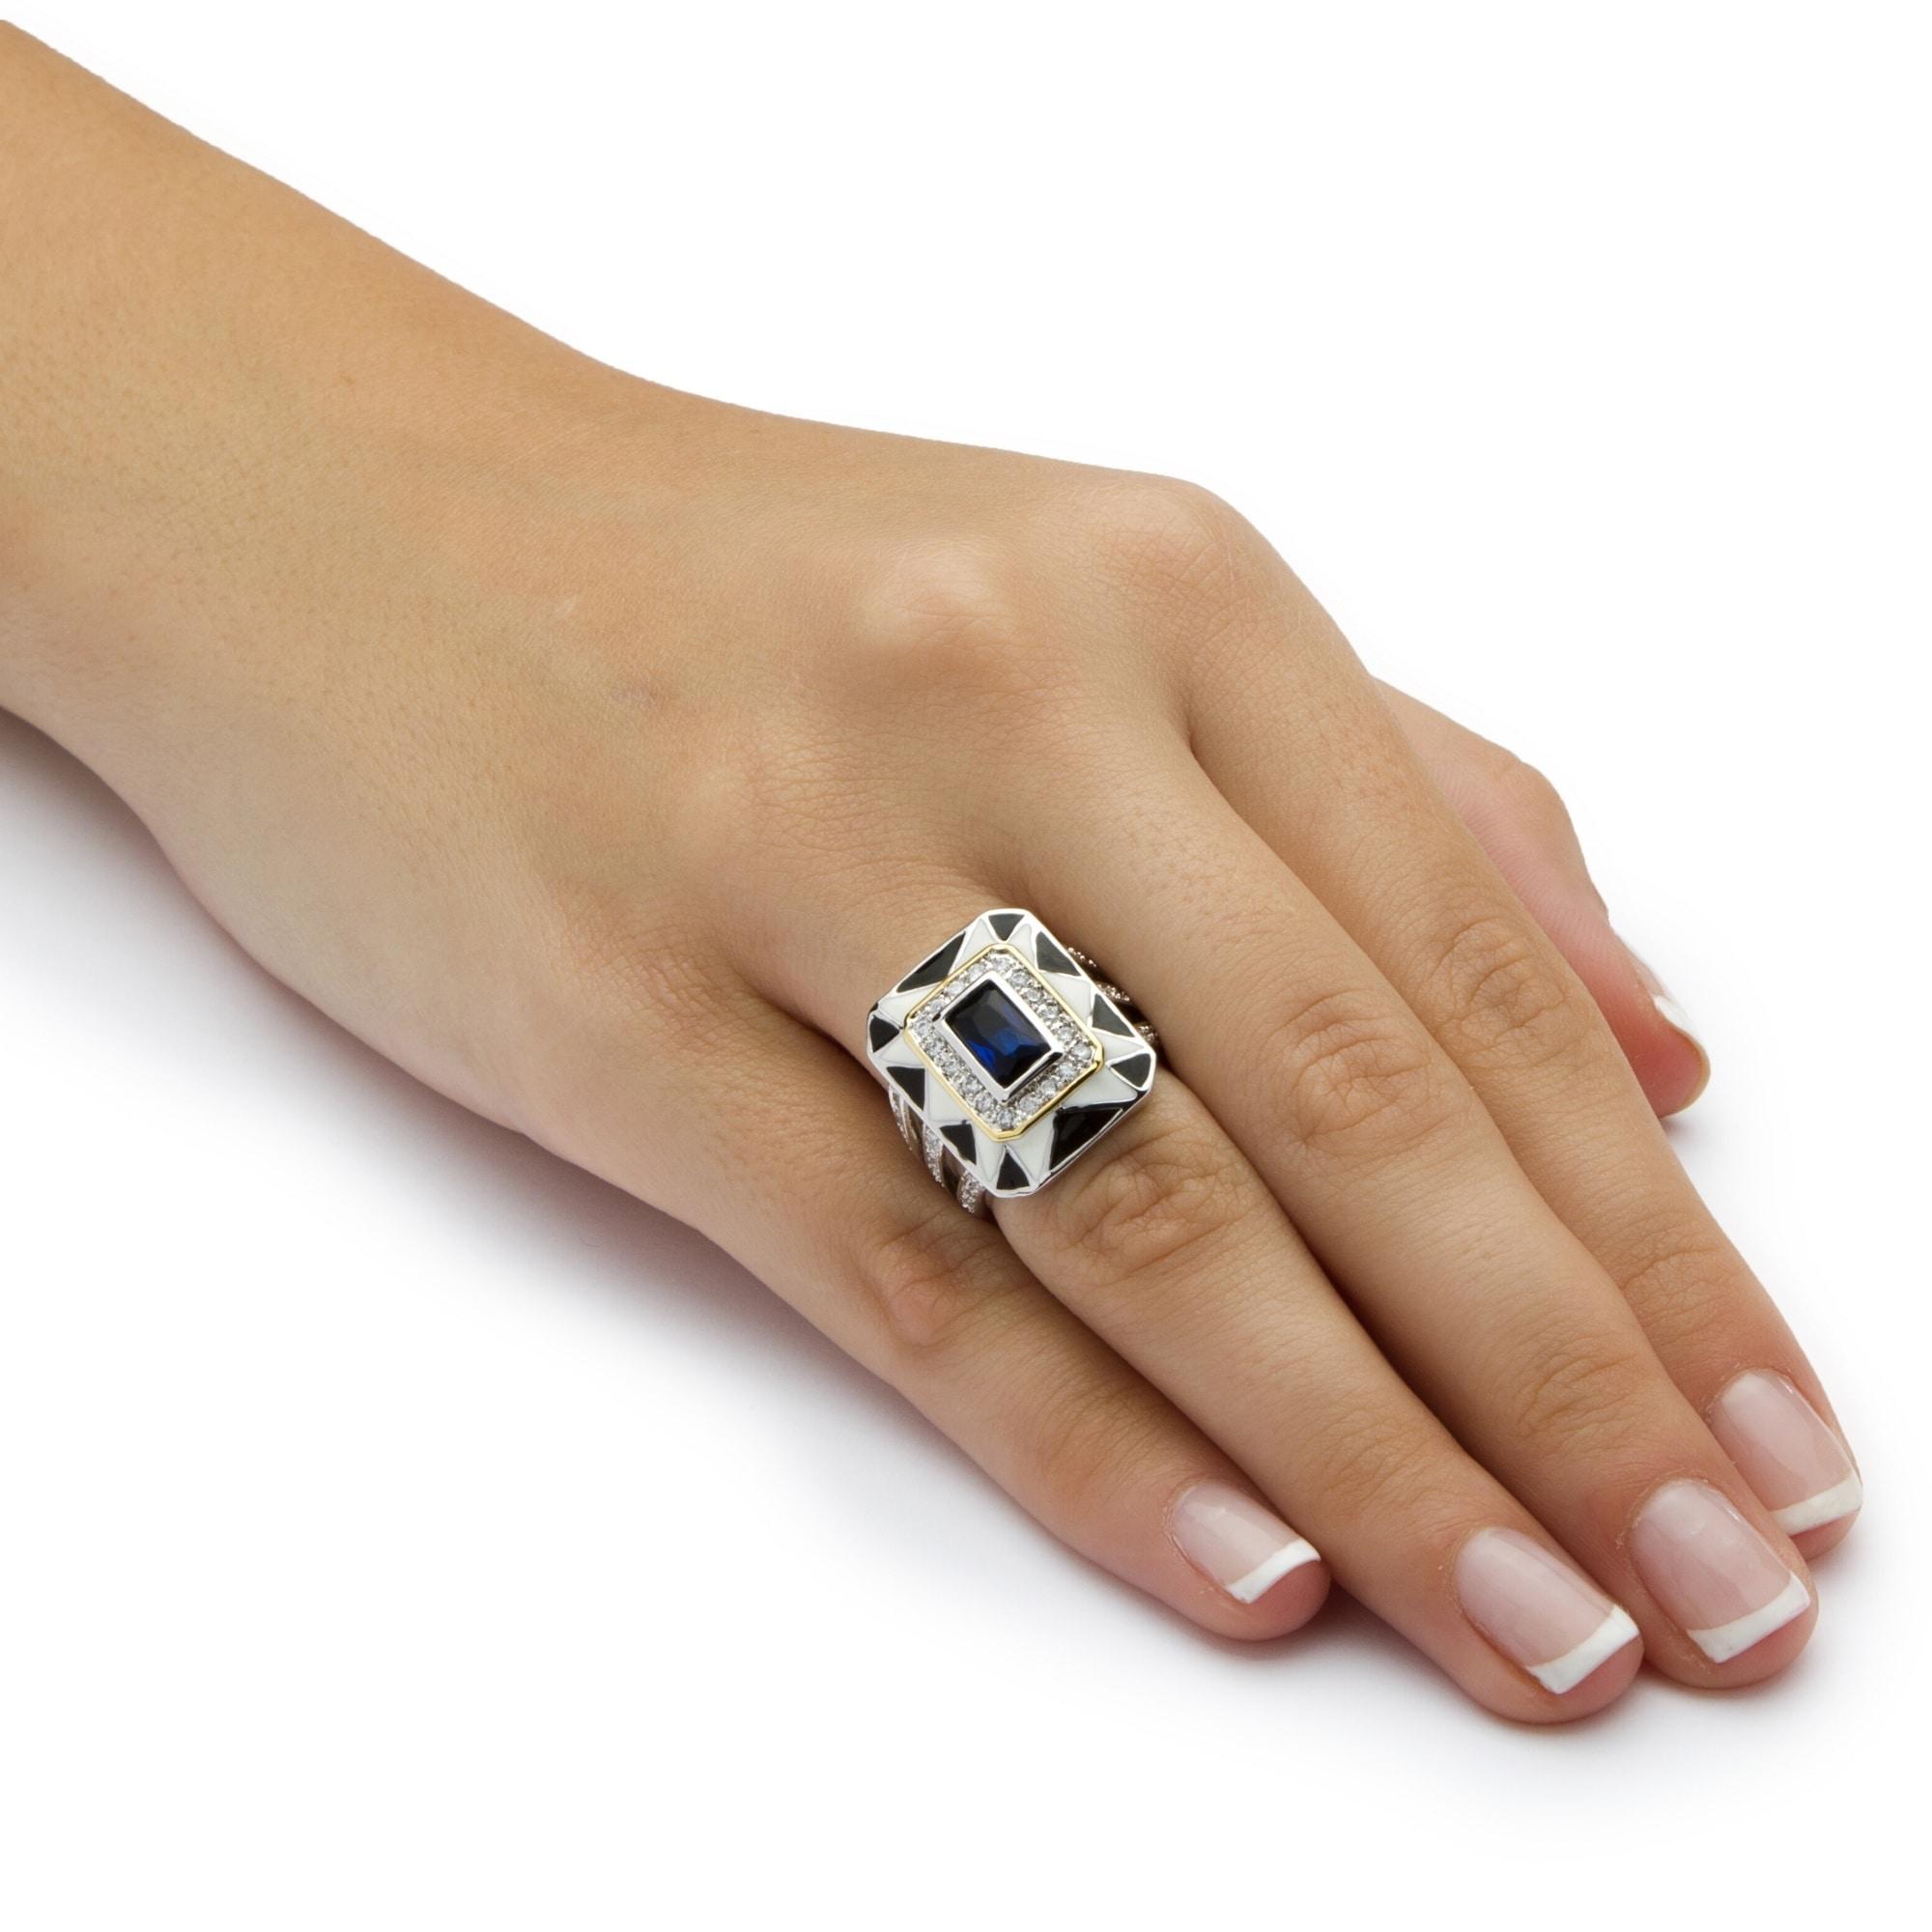 PalmBeach Jewelry PalmBeach 2.38 TCW Emerald-Cut Blue Crystal Art Deco Style Ring in Silvertone Color Fun